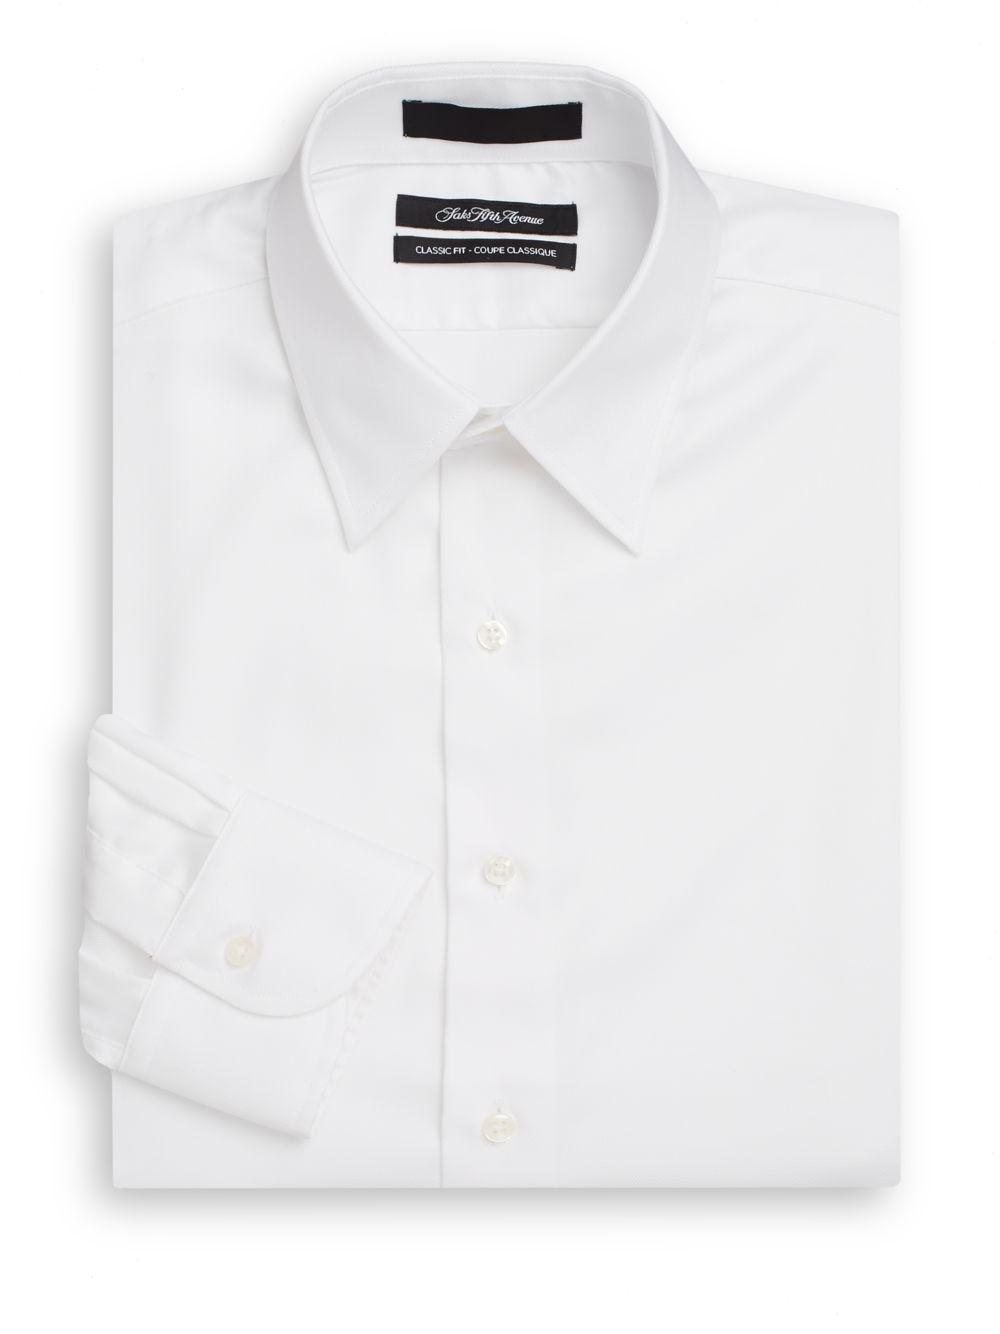 Saks Fifth Avenue Classic Fit Cotton Twill Dress Shirt